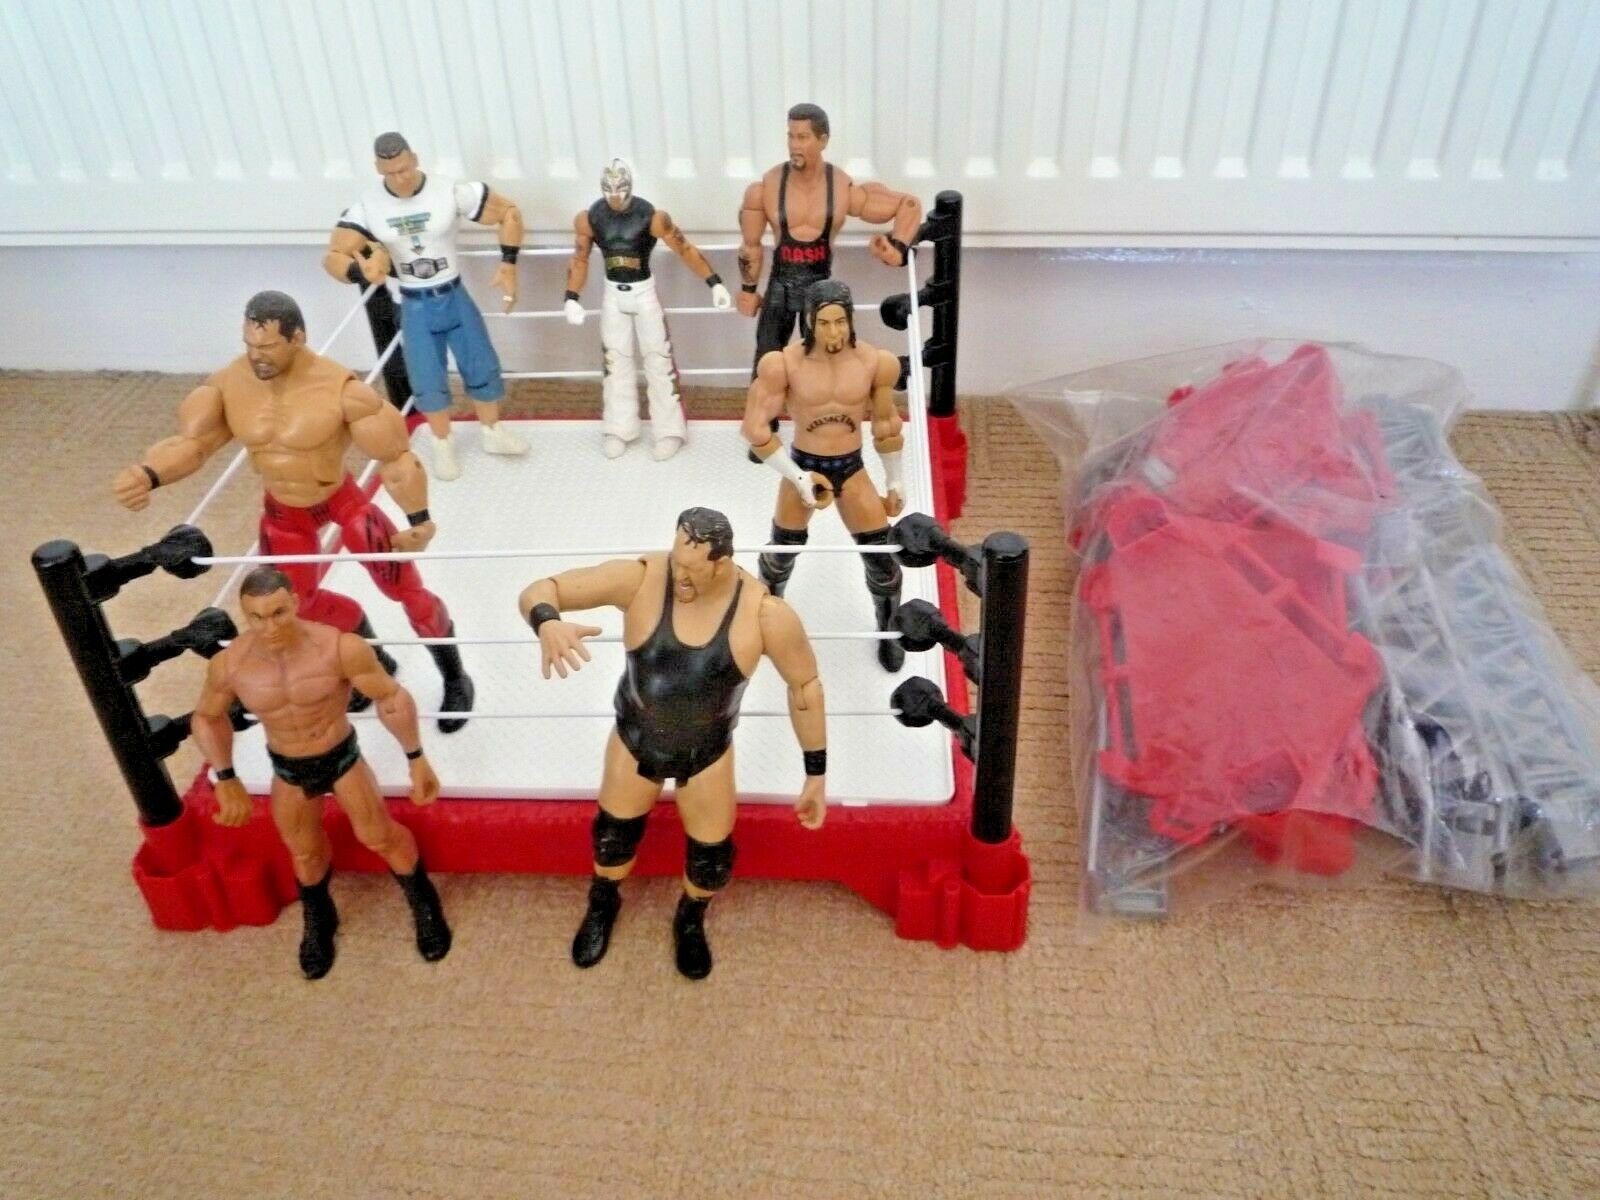 WWE   WWF CREATE A SUPERSTAR WRESTLING RING & 7 WRESTLING FIGURES   20 COMBOS